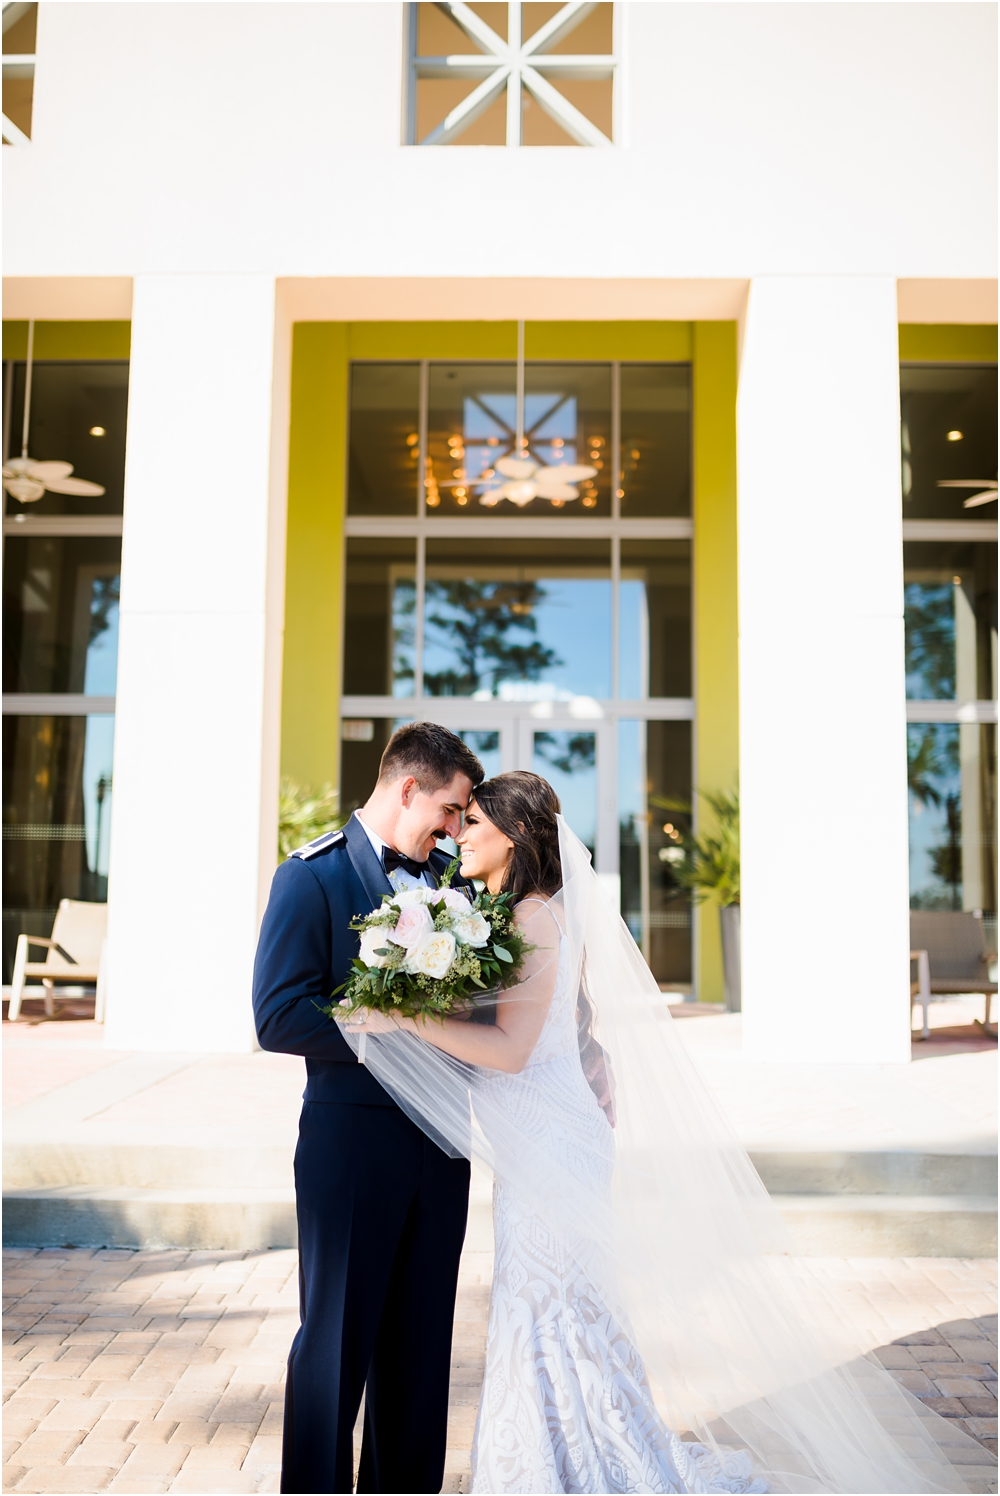 amack-wedding-kiersten-stevenson-photography-30a-panama-city-beach-dothan-tallahassee-(173-of-882).JPG